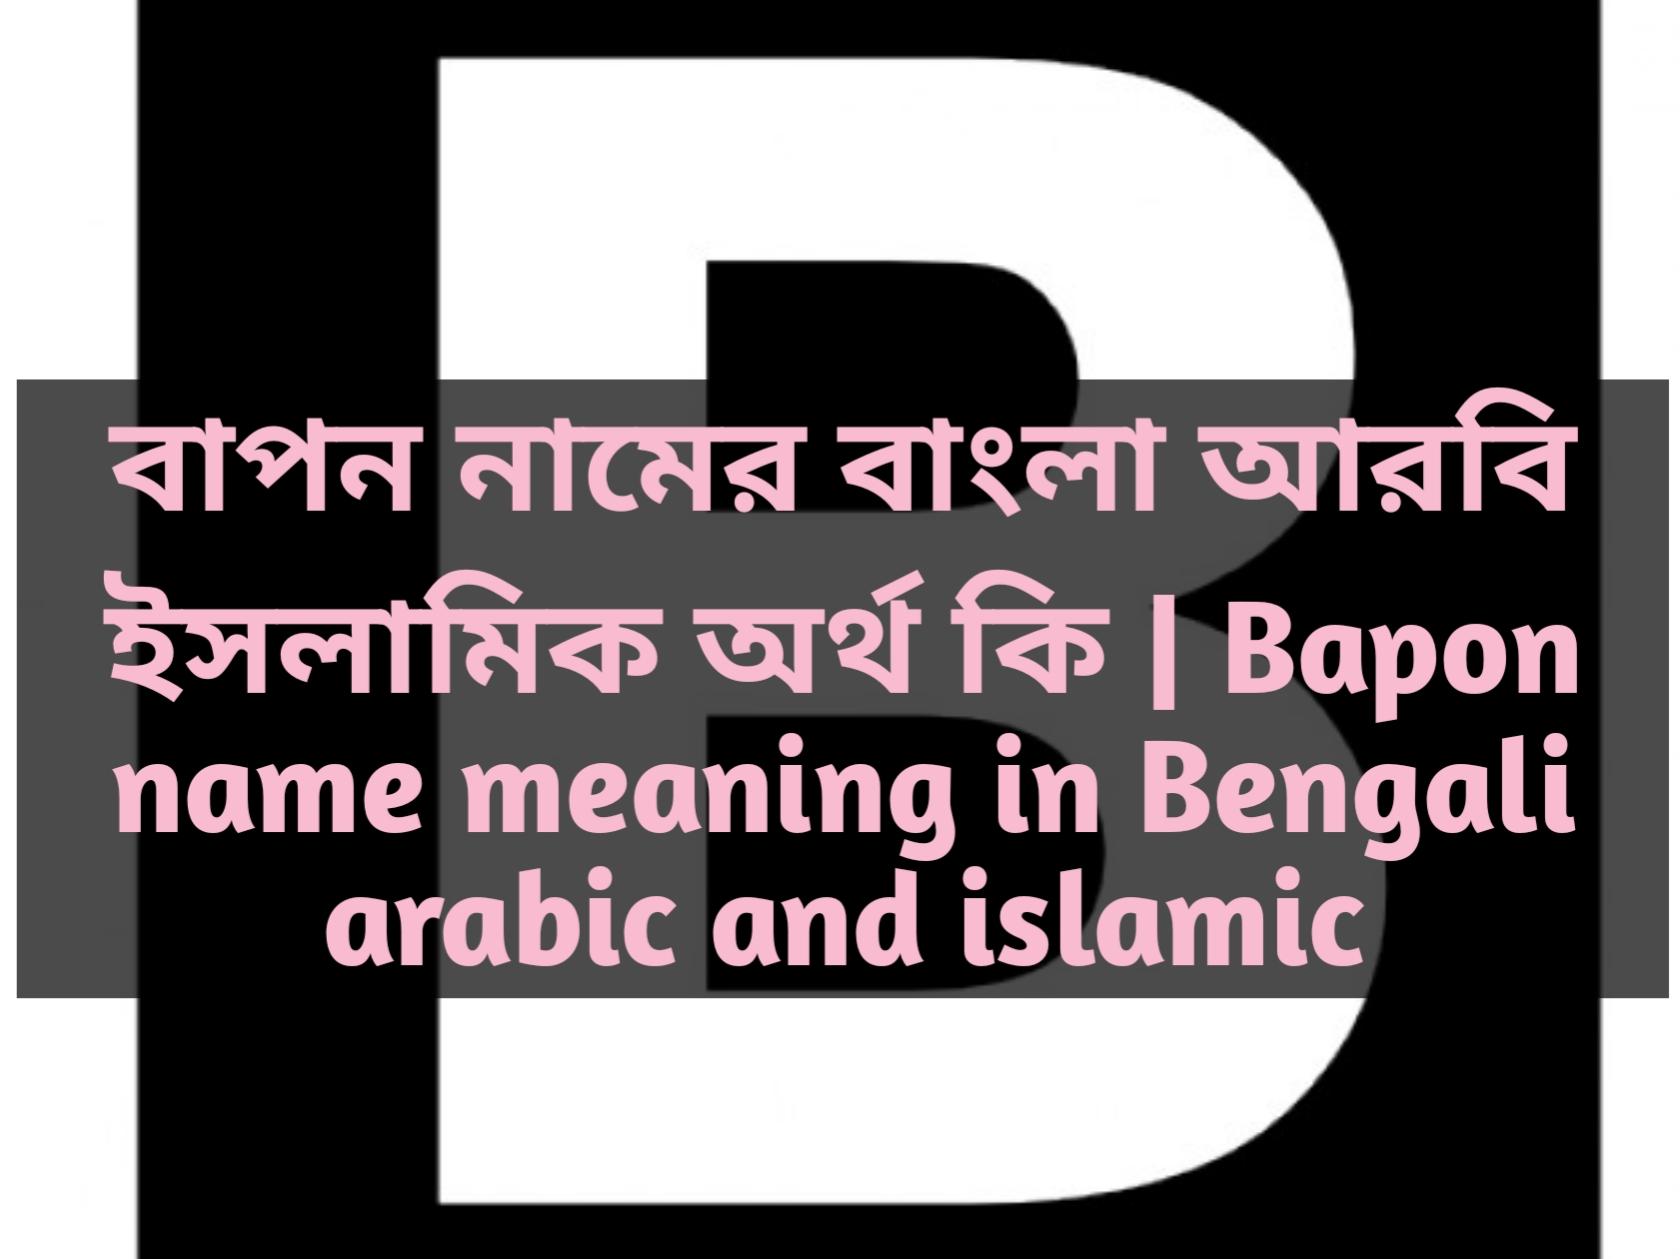 Bapon name meaning in Bengali, বাপন নামের অর্থ কি, বাপন নামের বাংলা অর্থ কি, বাপন নামের ইসলামিক অর্থ কি,